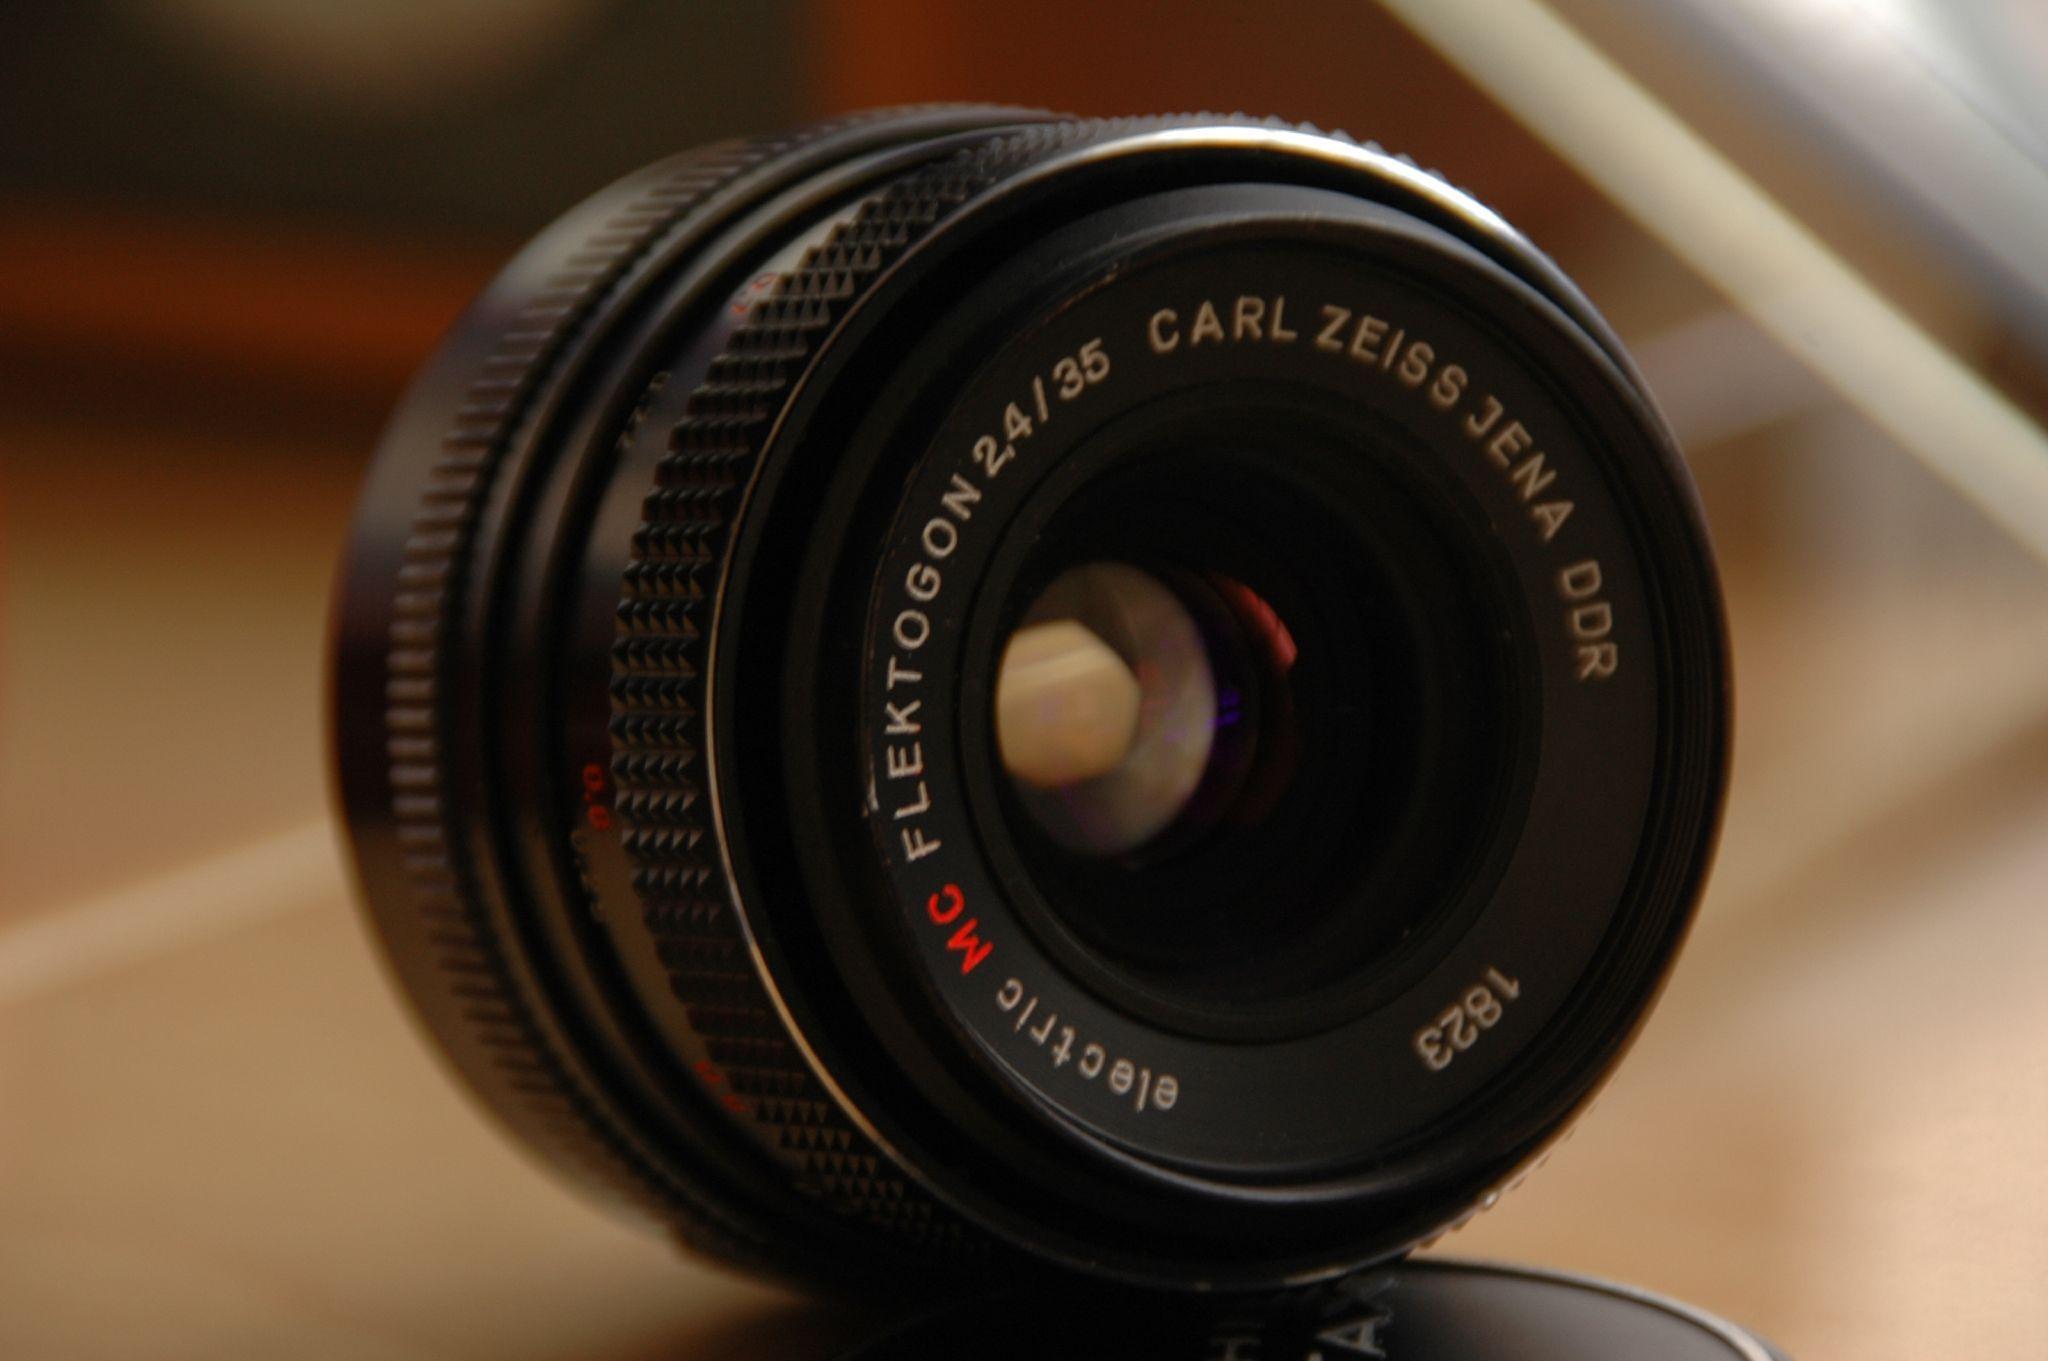 Carl Zeiss Flektogon 35mm F 2 4